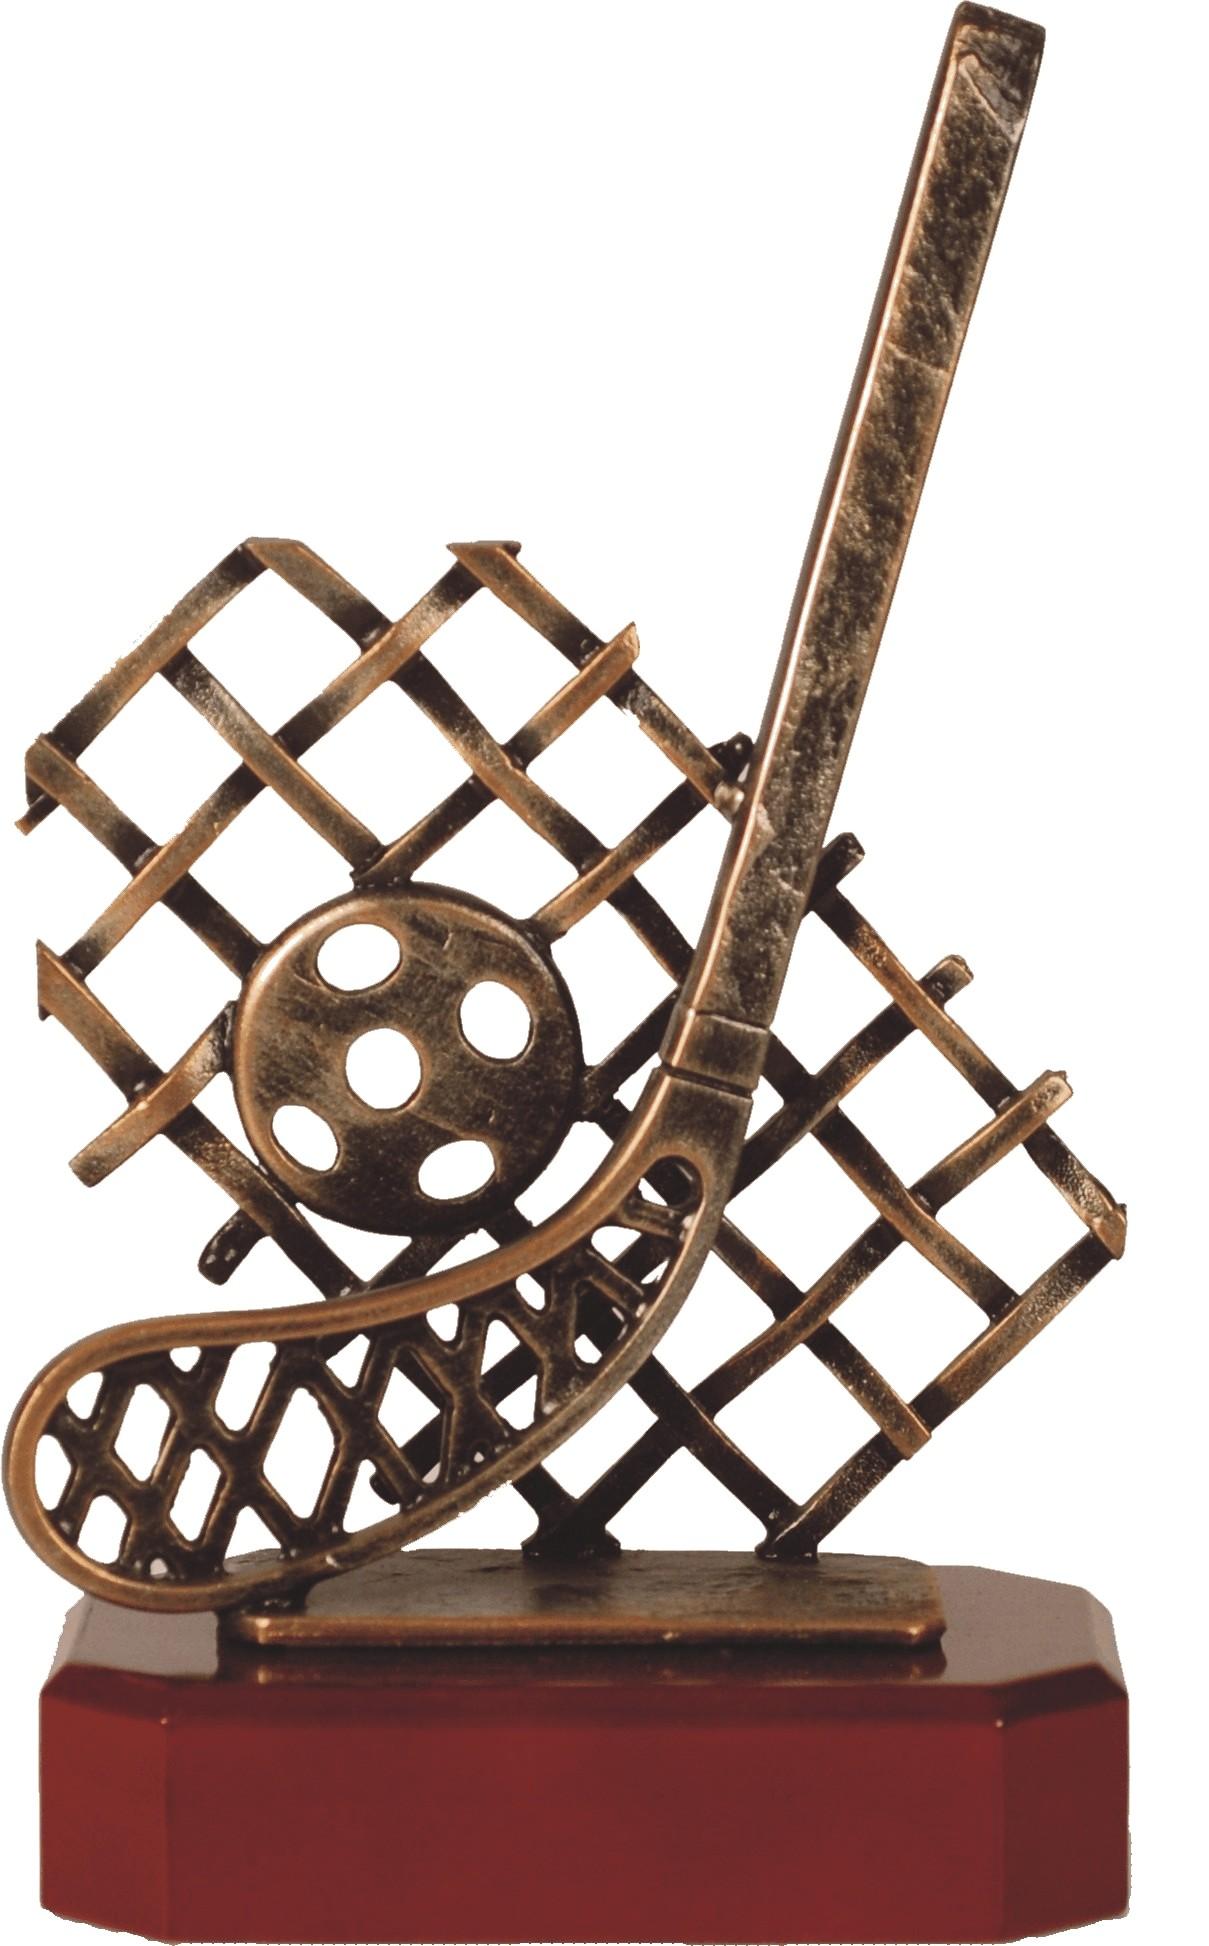 Luxe trofee hockey / hockeystick met bal en net 24,5cm WBEL 276BB